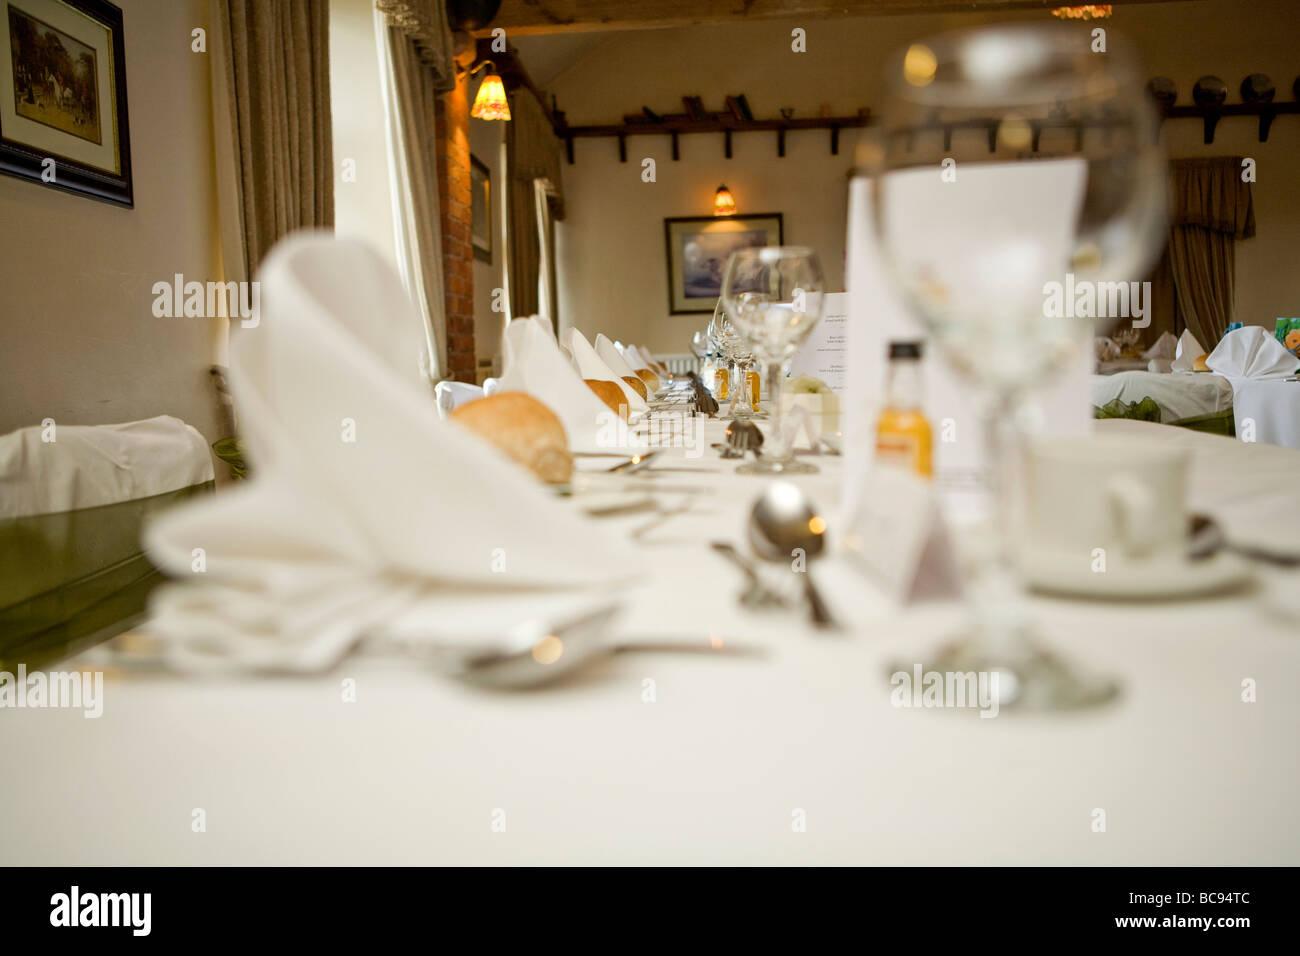 English Wedding Table Stock Photos & English Wedding Table Stock ...